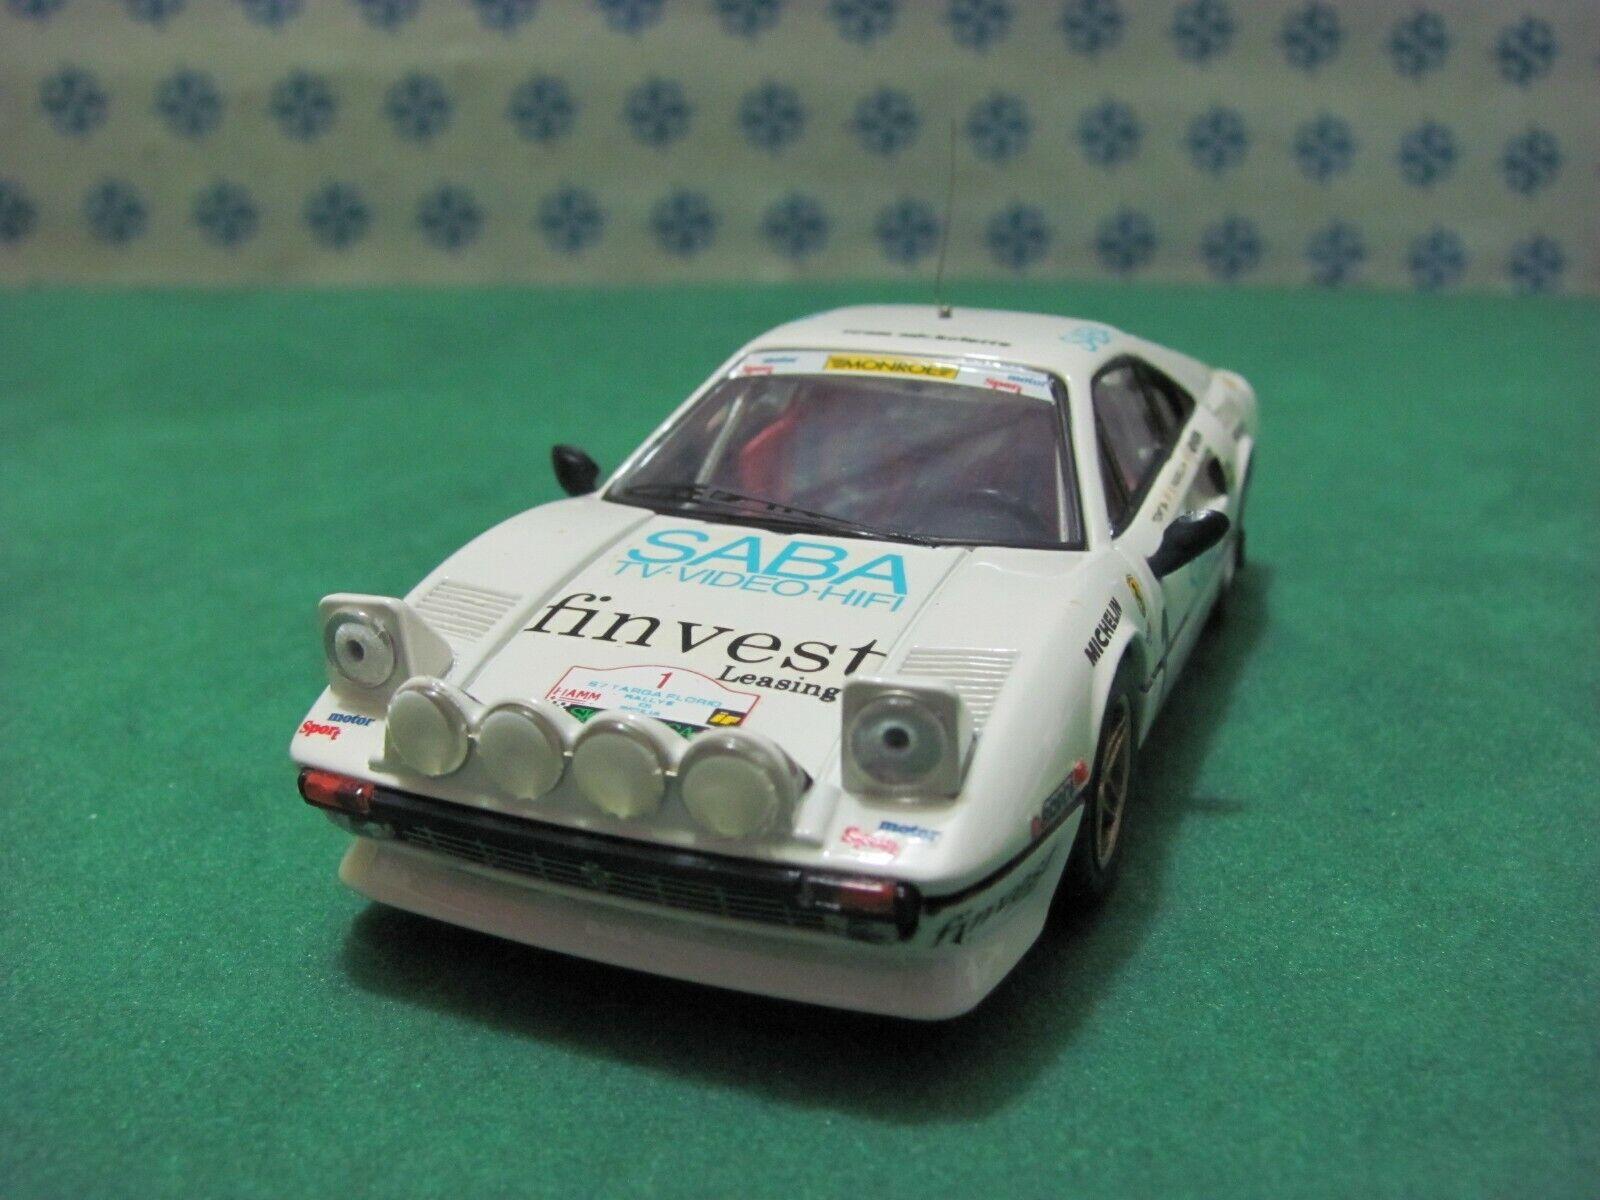 FERRARI 308 GTB 3000cc. coupè   Targa Florio  1983    - 1 43 Best 9211